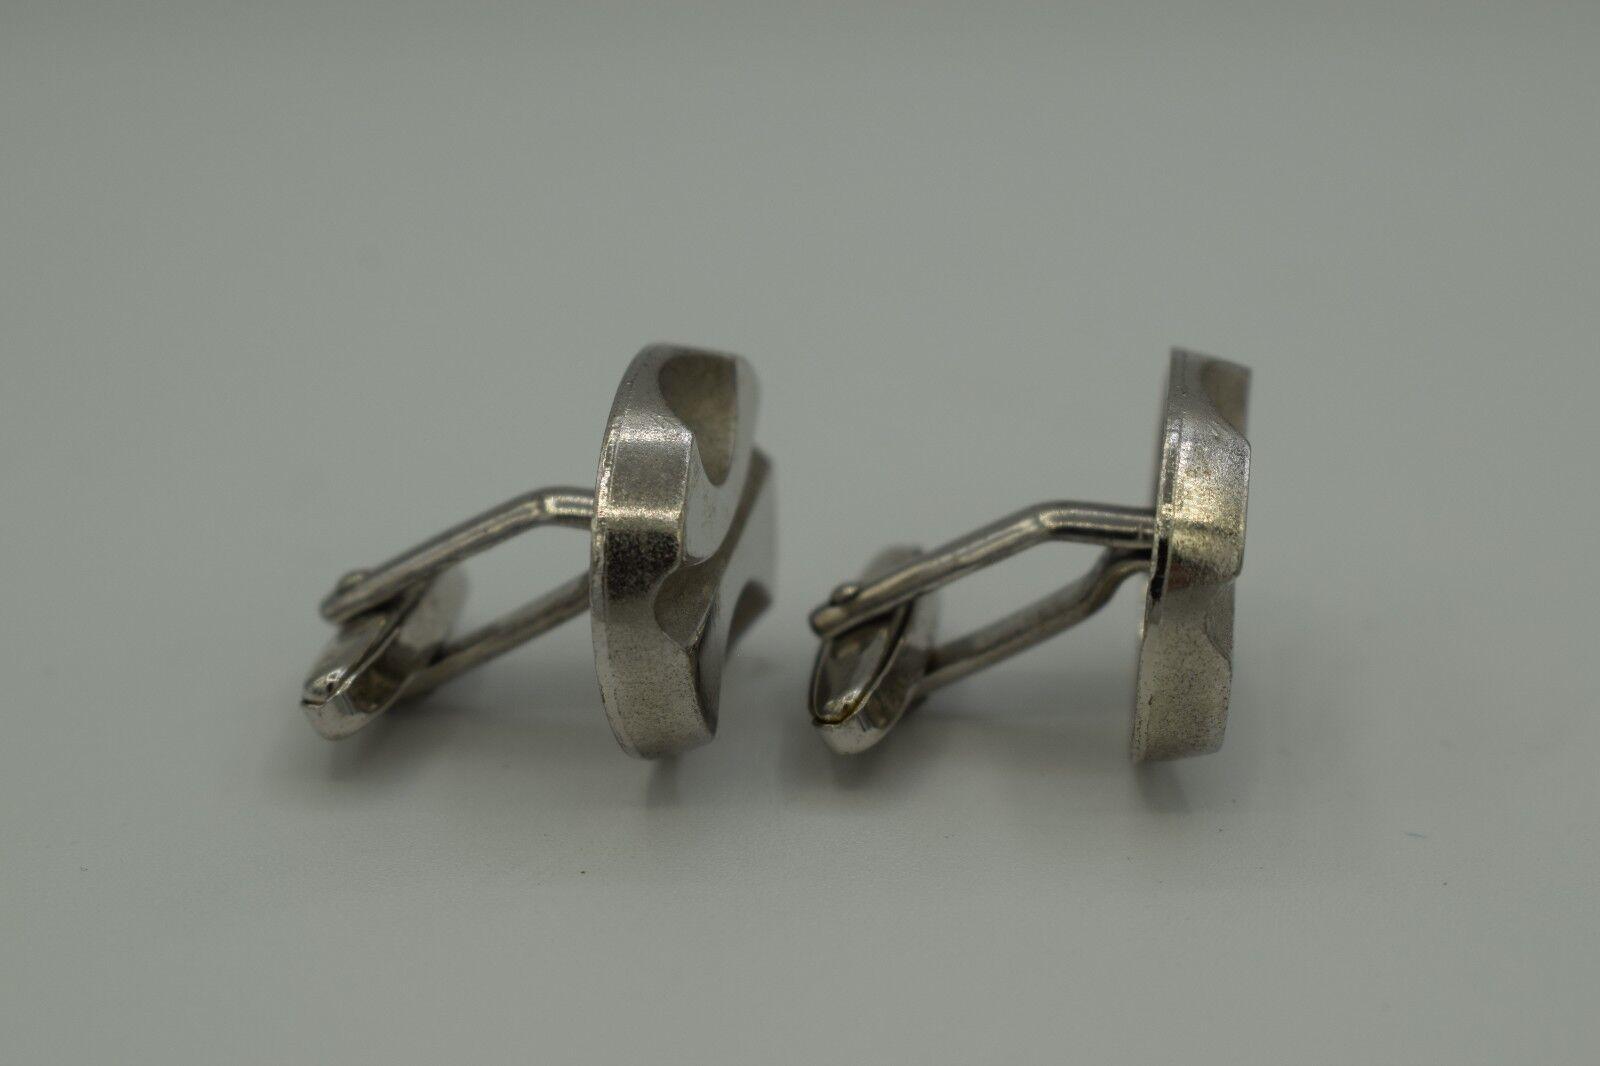 Gemelli-misura da tavola 2.25 x 1.75 cm - - - 800er argentoO-bene - 289bd9